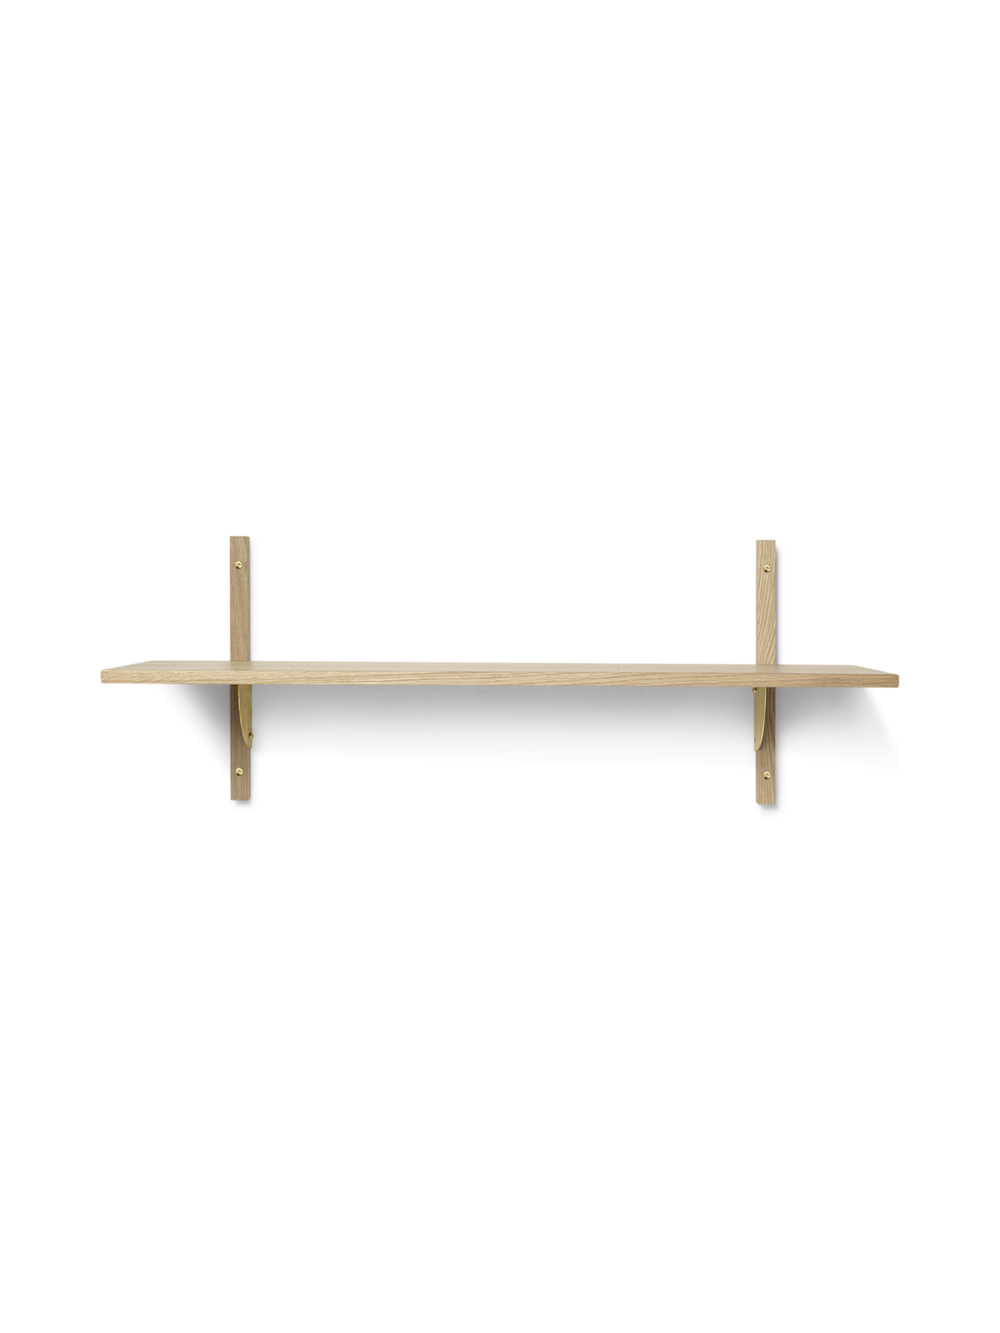 Sector Shelf - Single - Wide - Natural - Brass